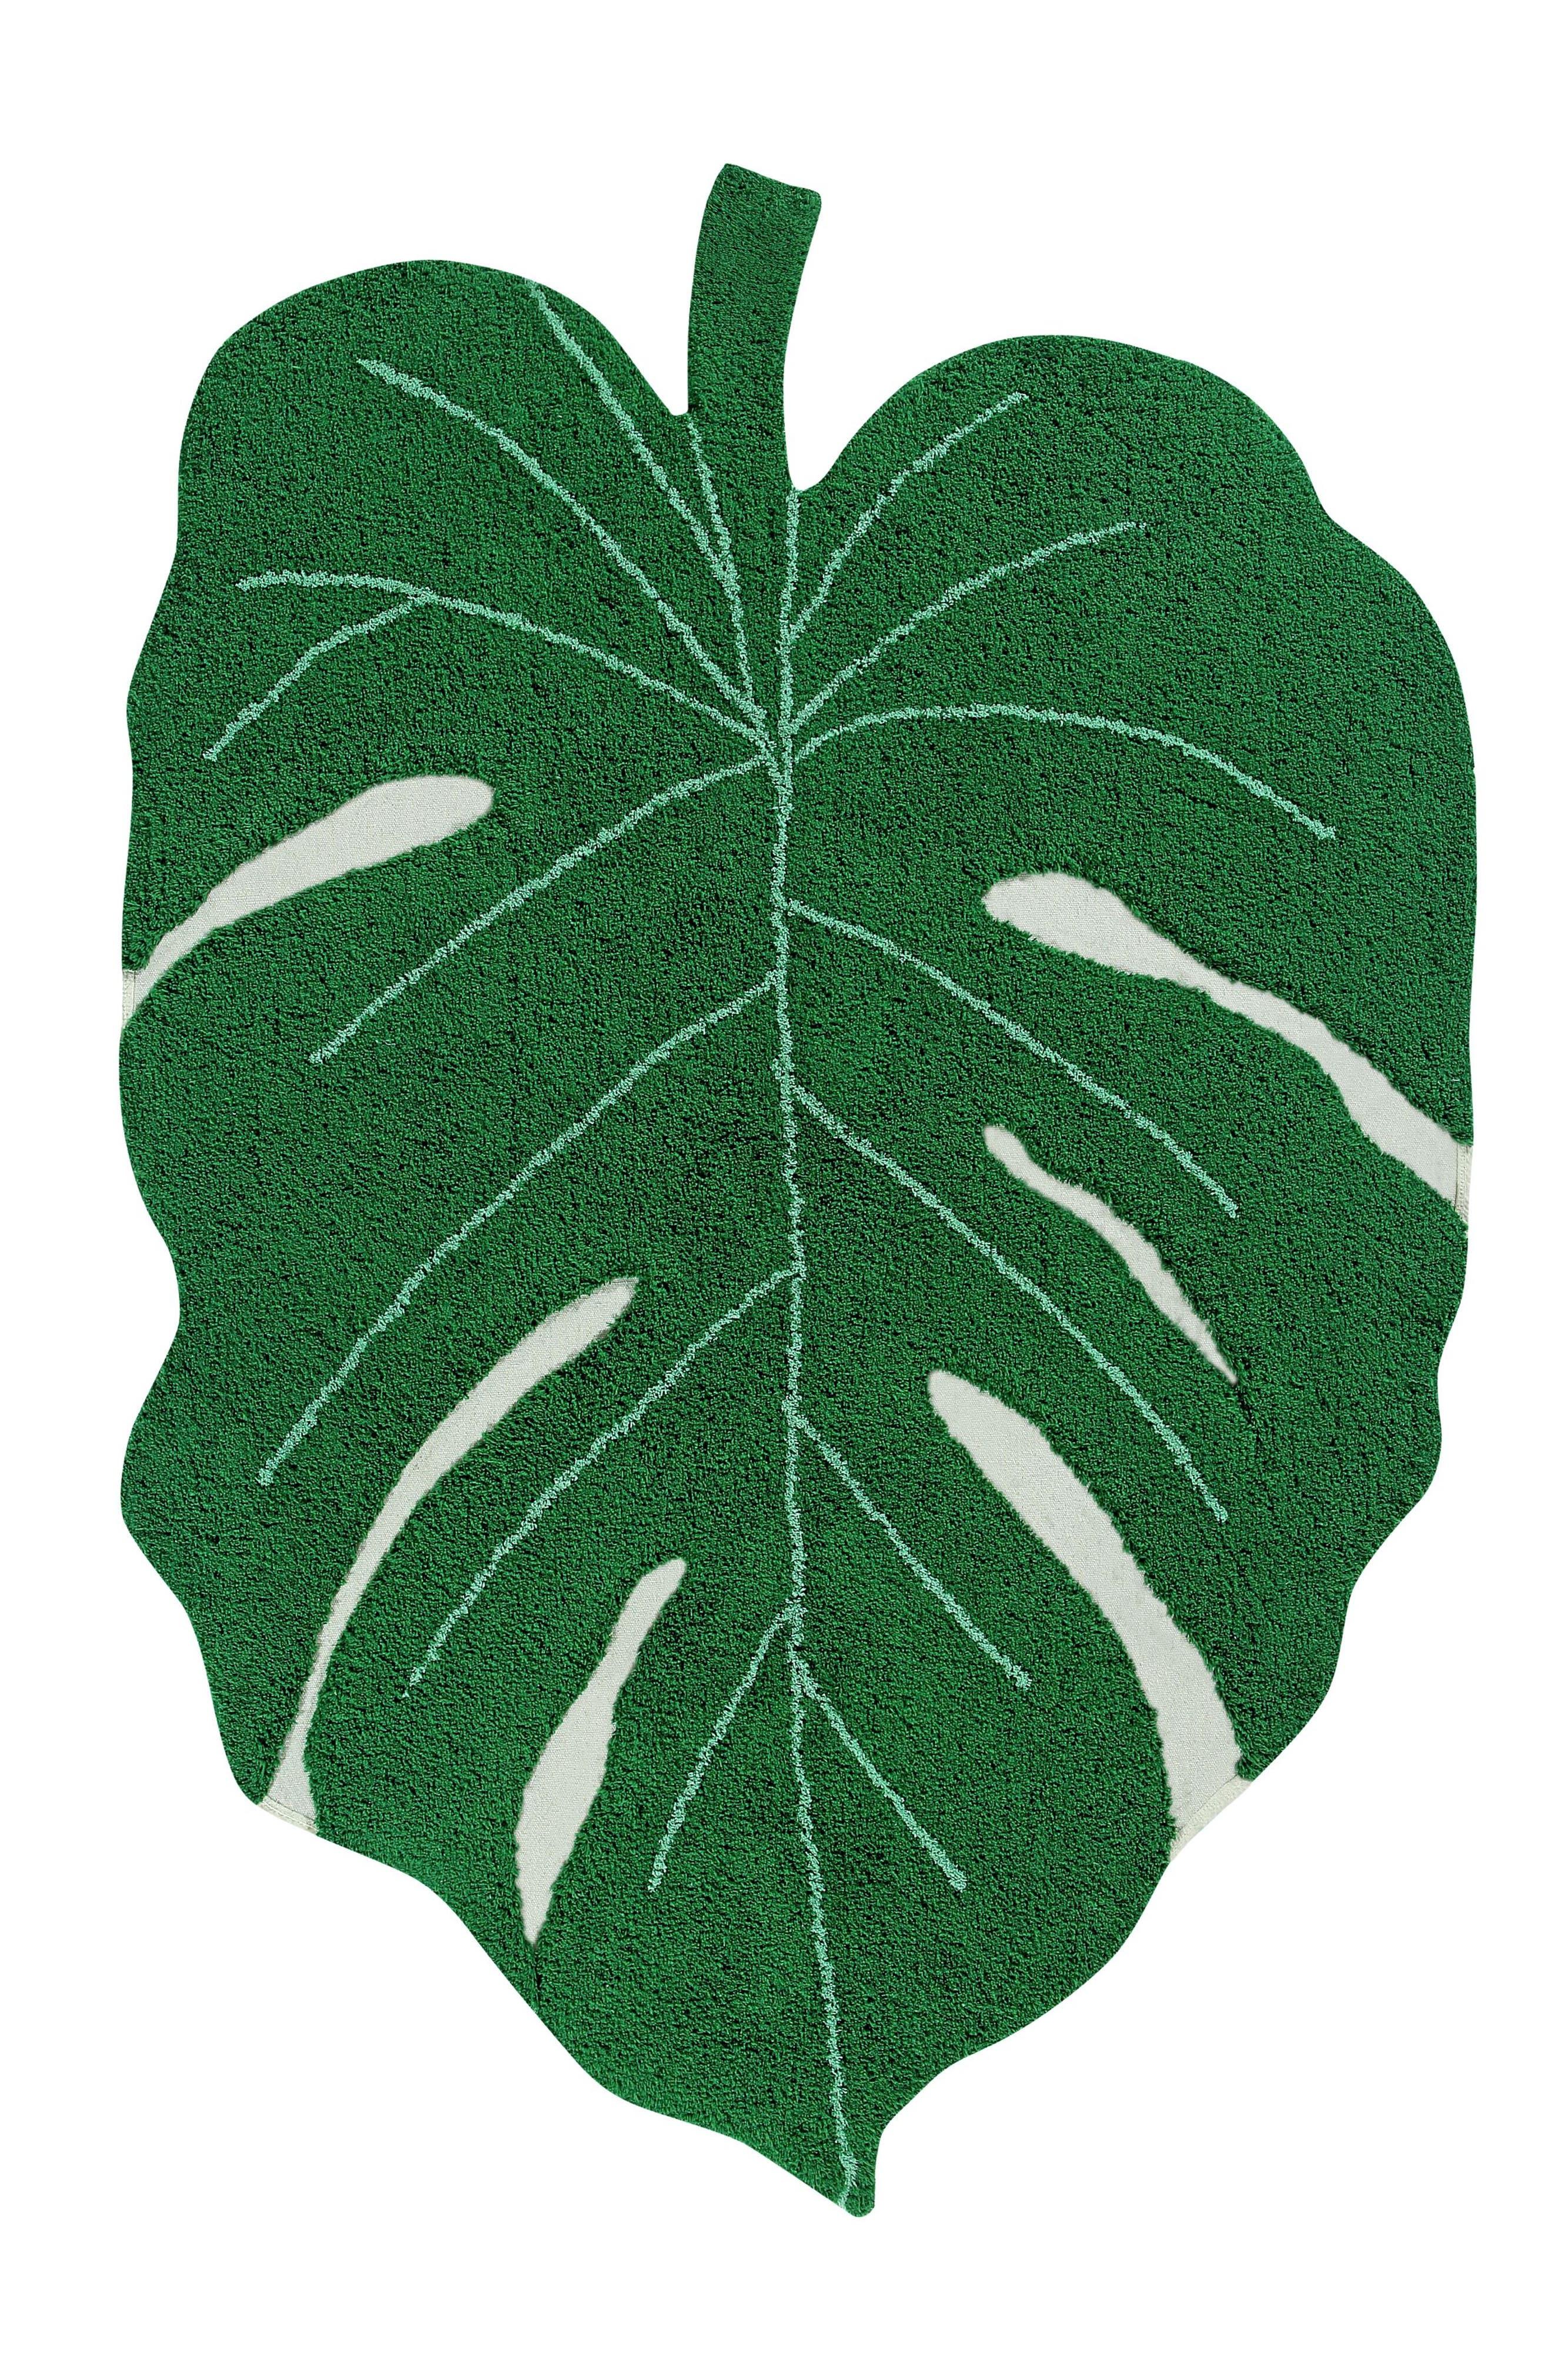 Monstera Leaf Rug,                             Main thumbnail 1, color,                             MONSTERA LEAF